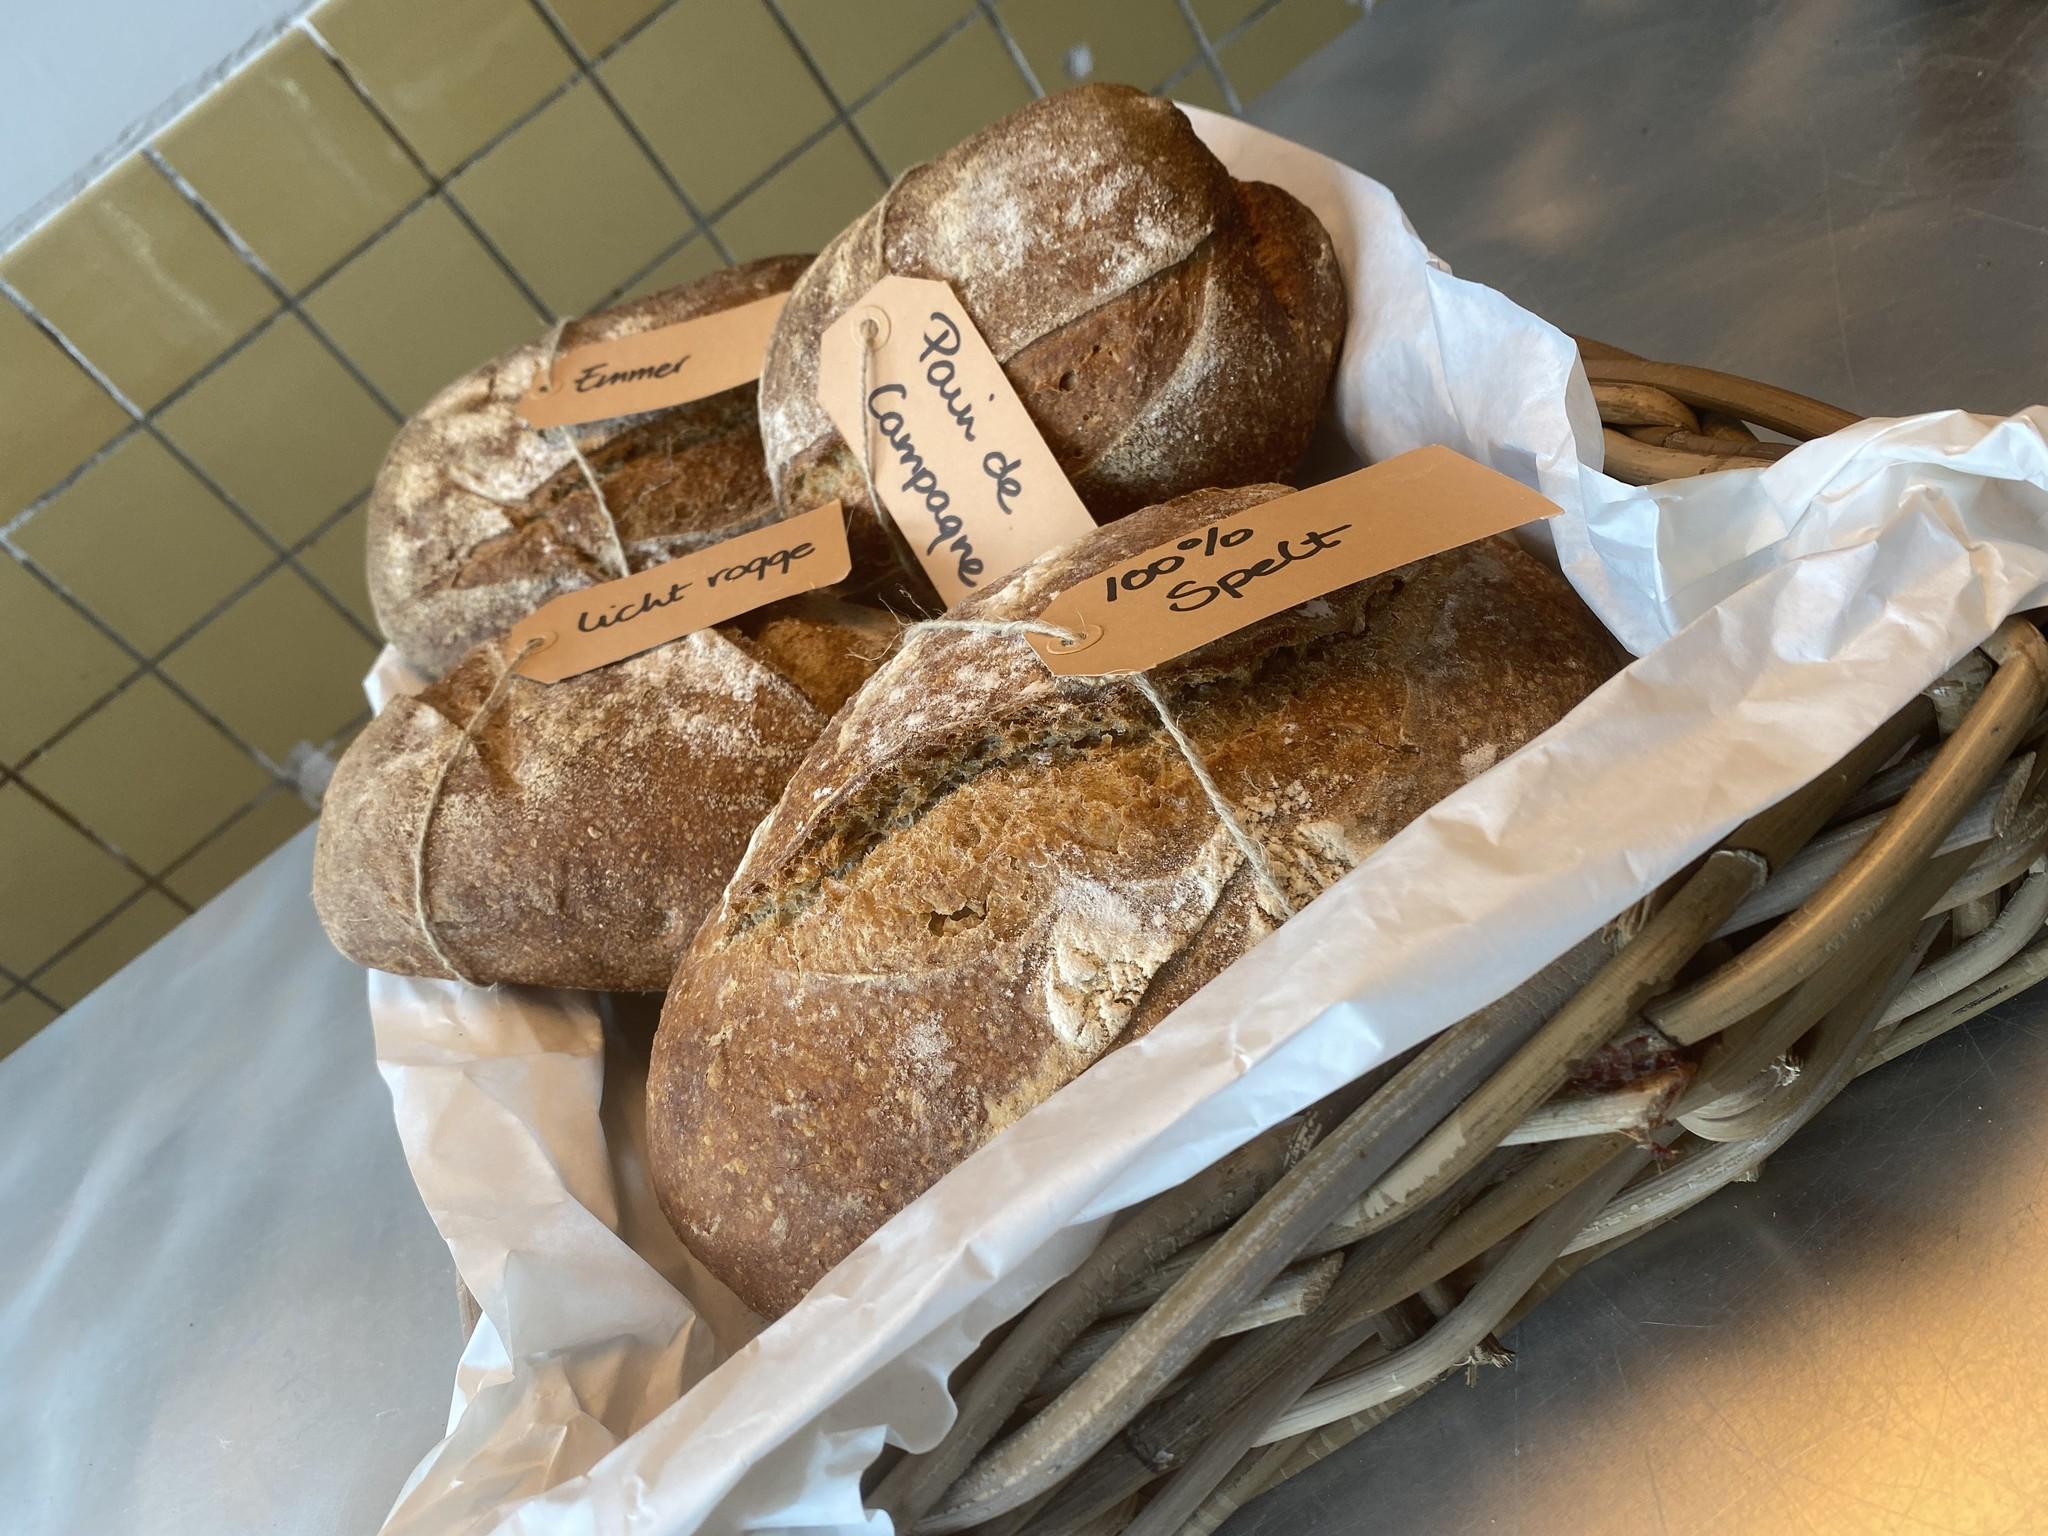 Emmertarwe brood